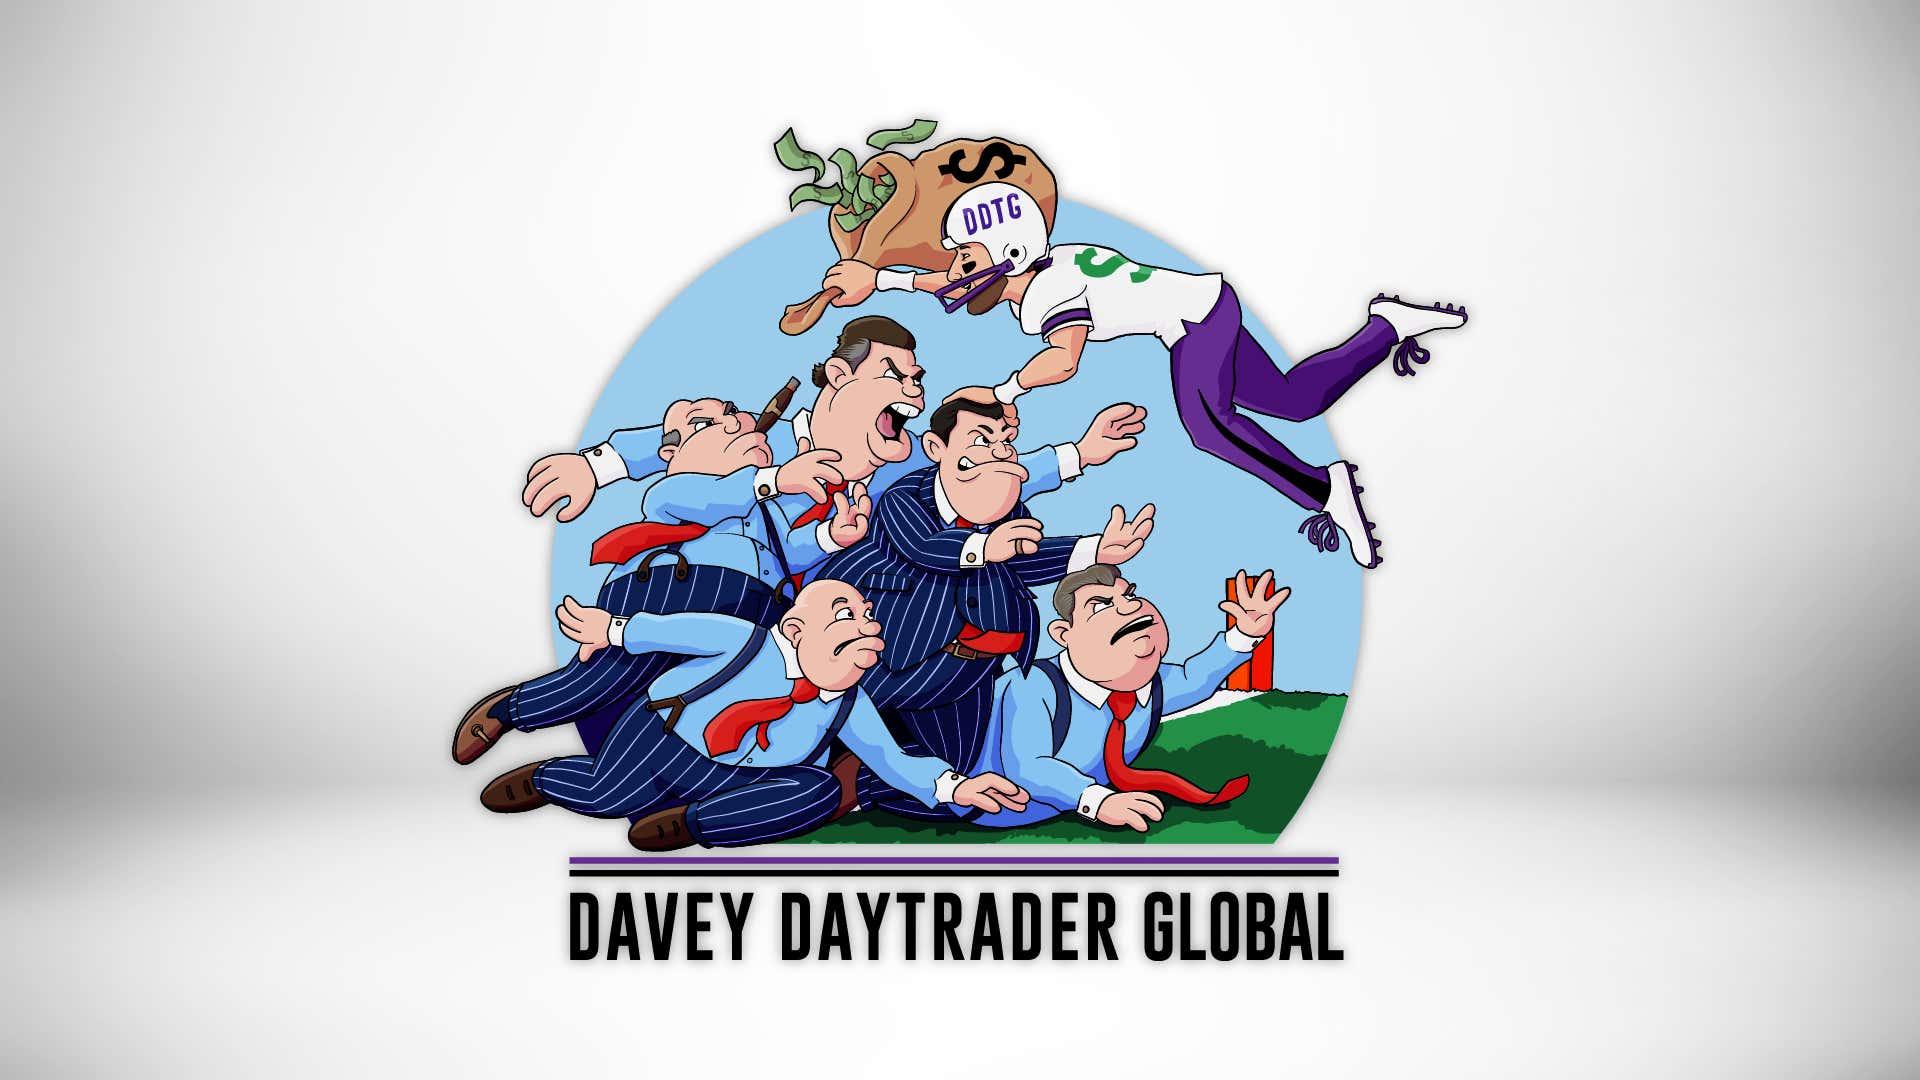 Davey Day Trader – April 21, 2020